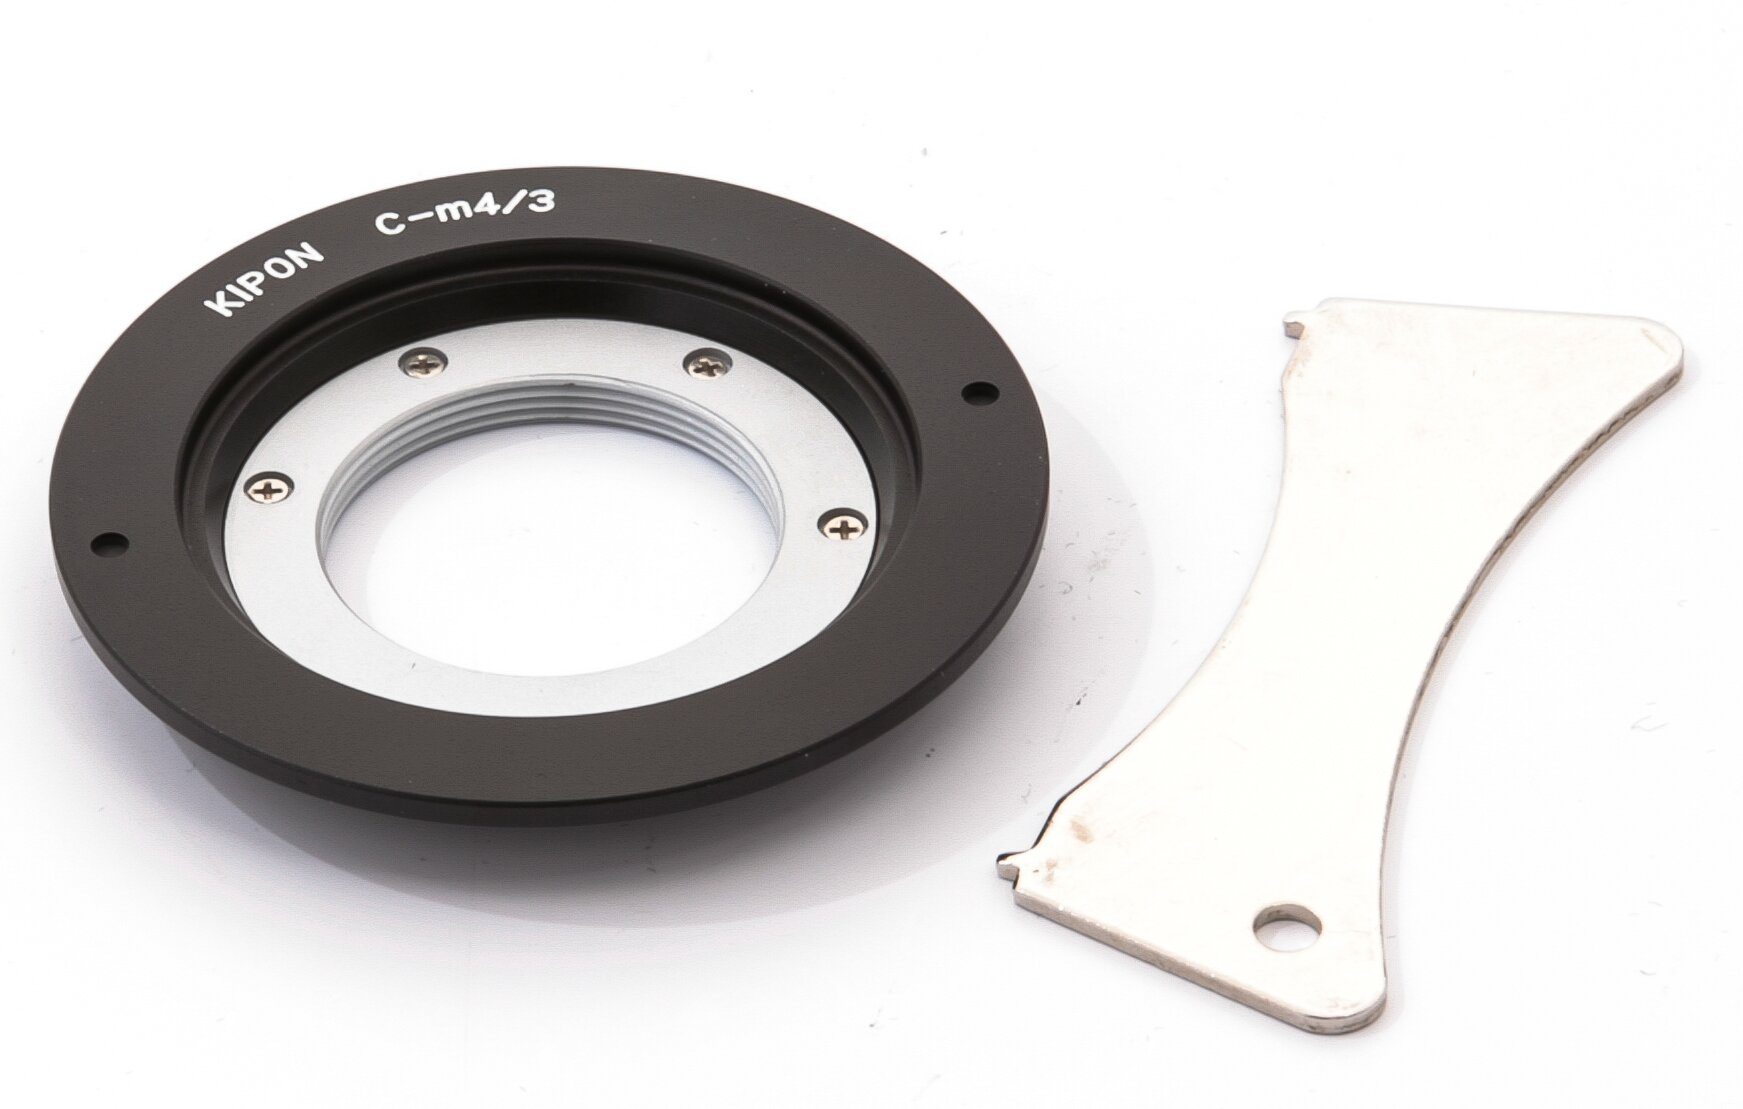 Adapter C-mount Objektive an Micro Fourthirds Gehäuse